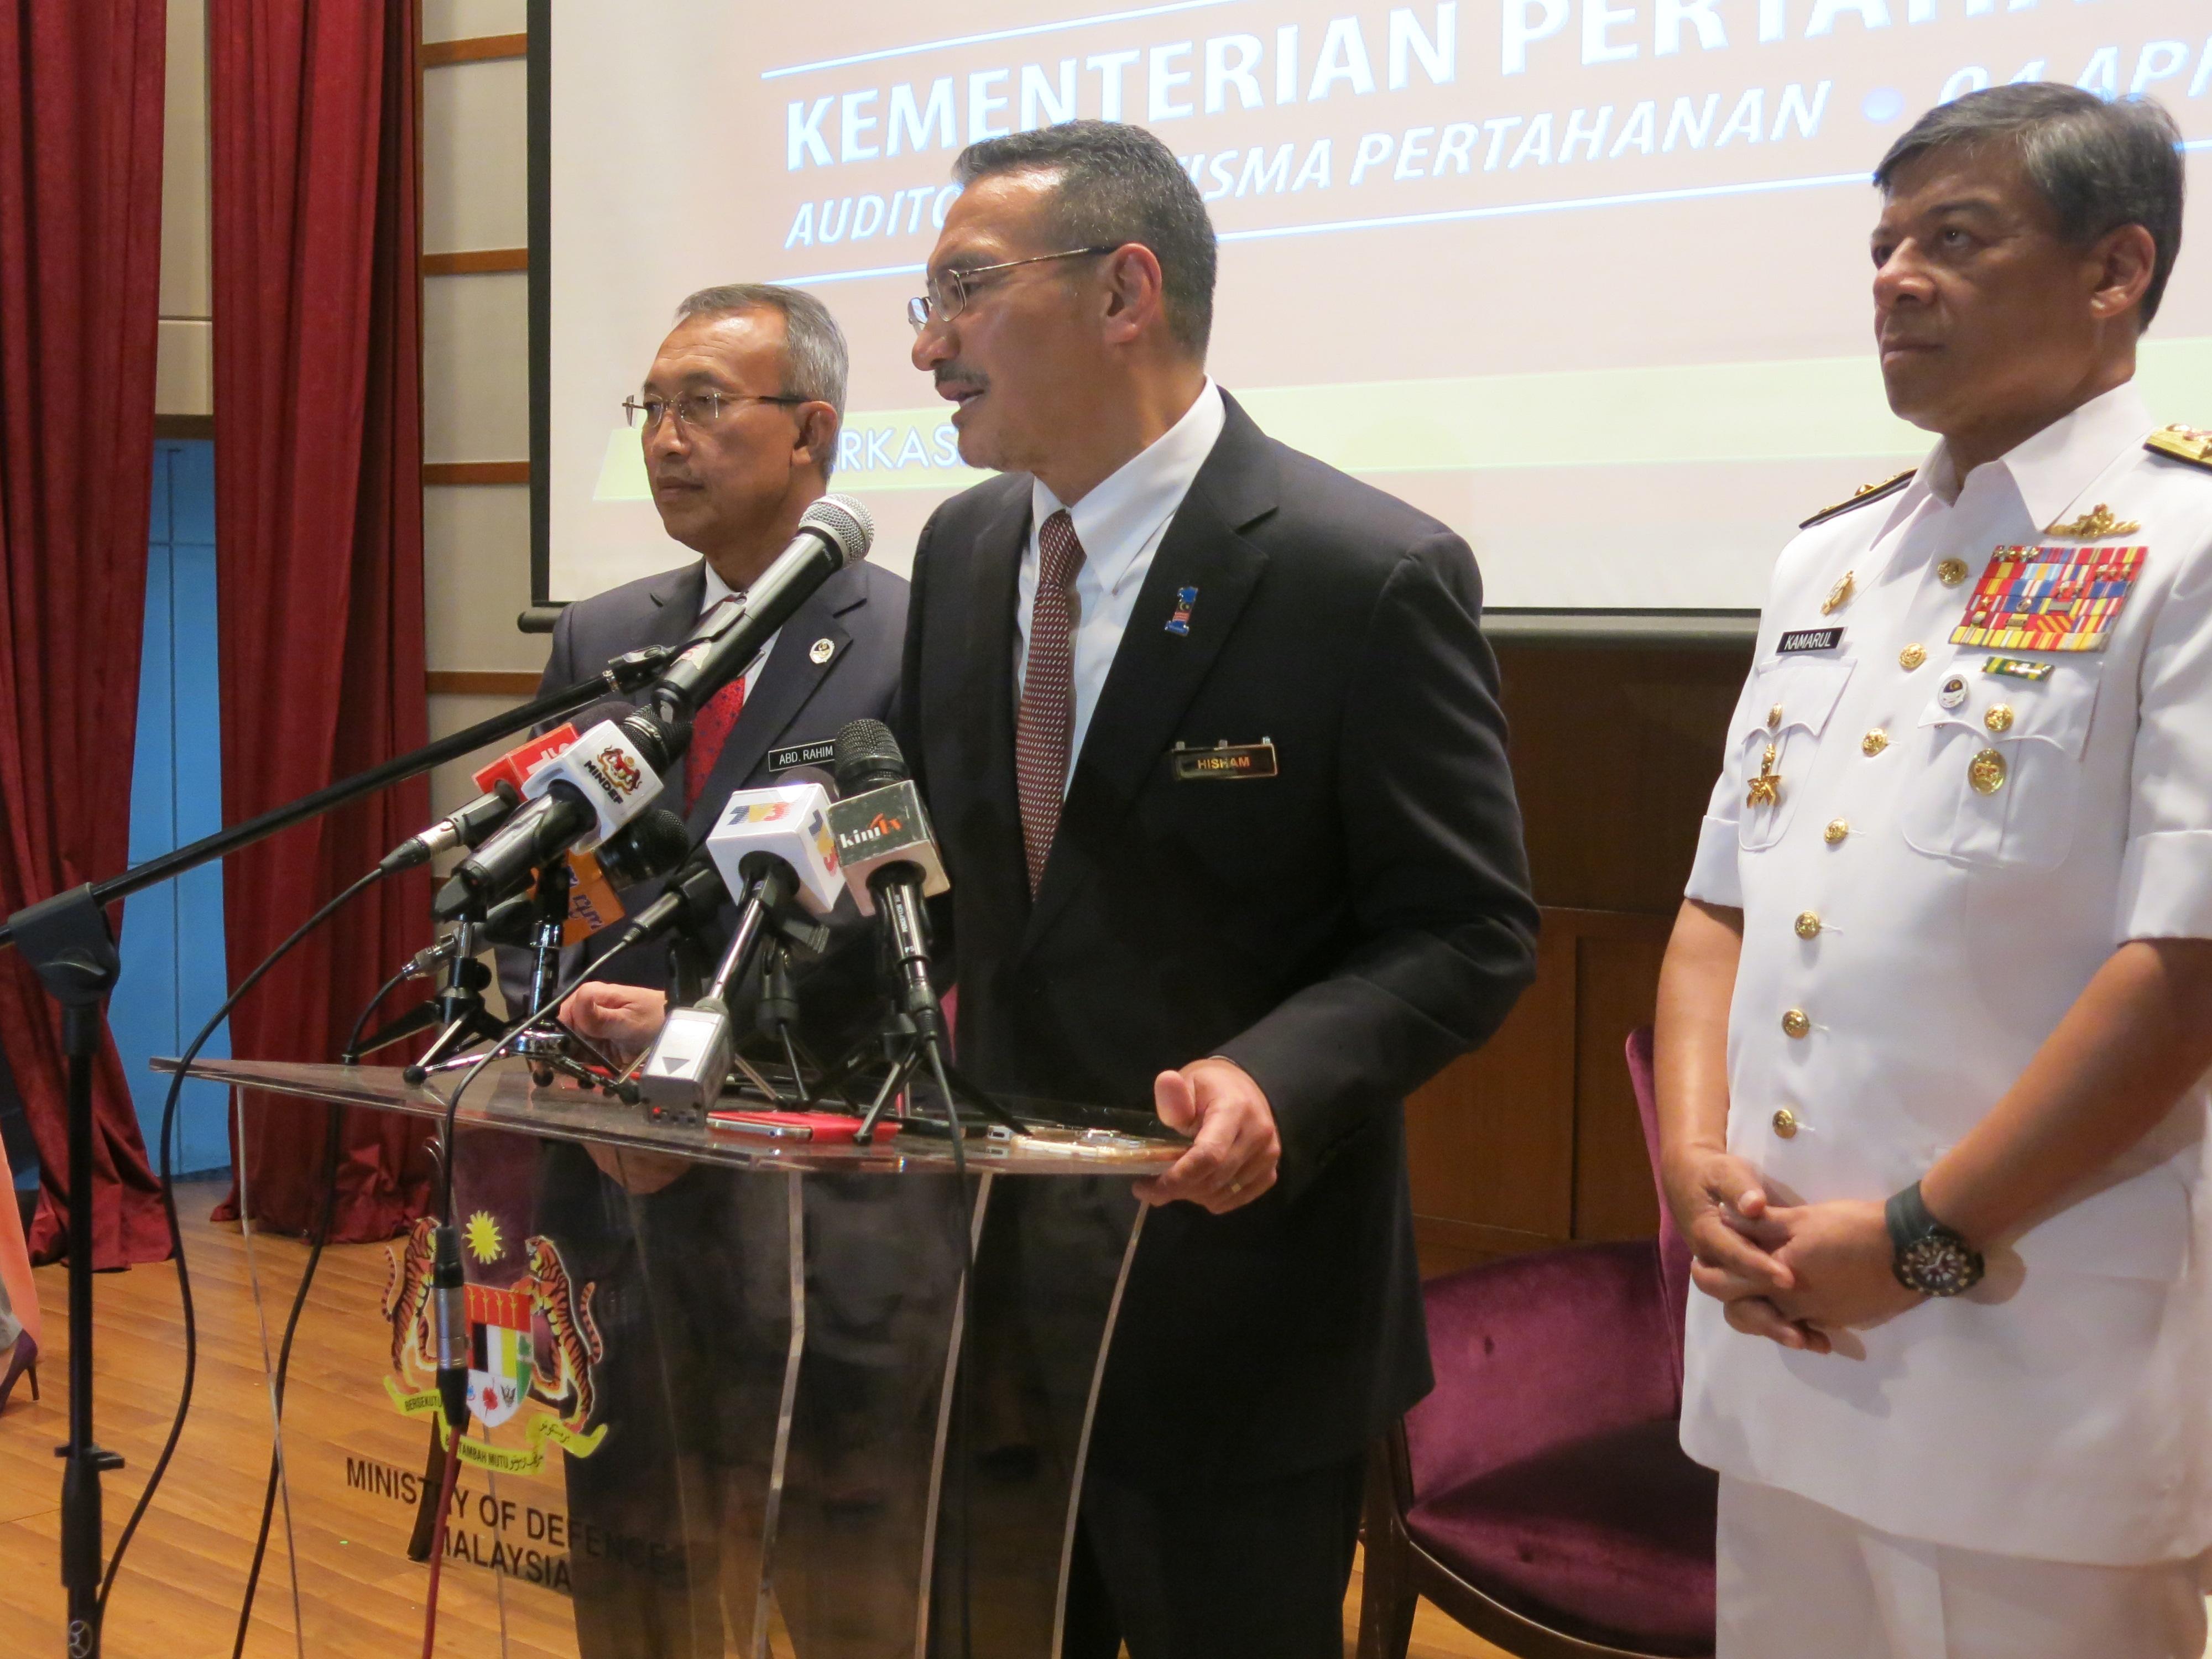 hishammuddin defence minister of malaysia